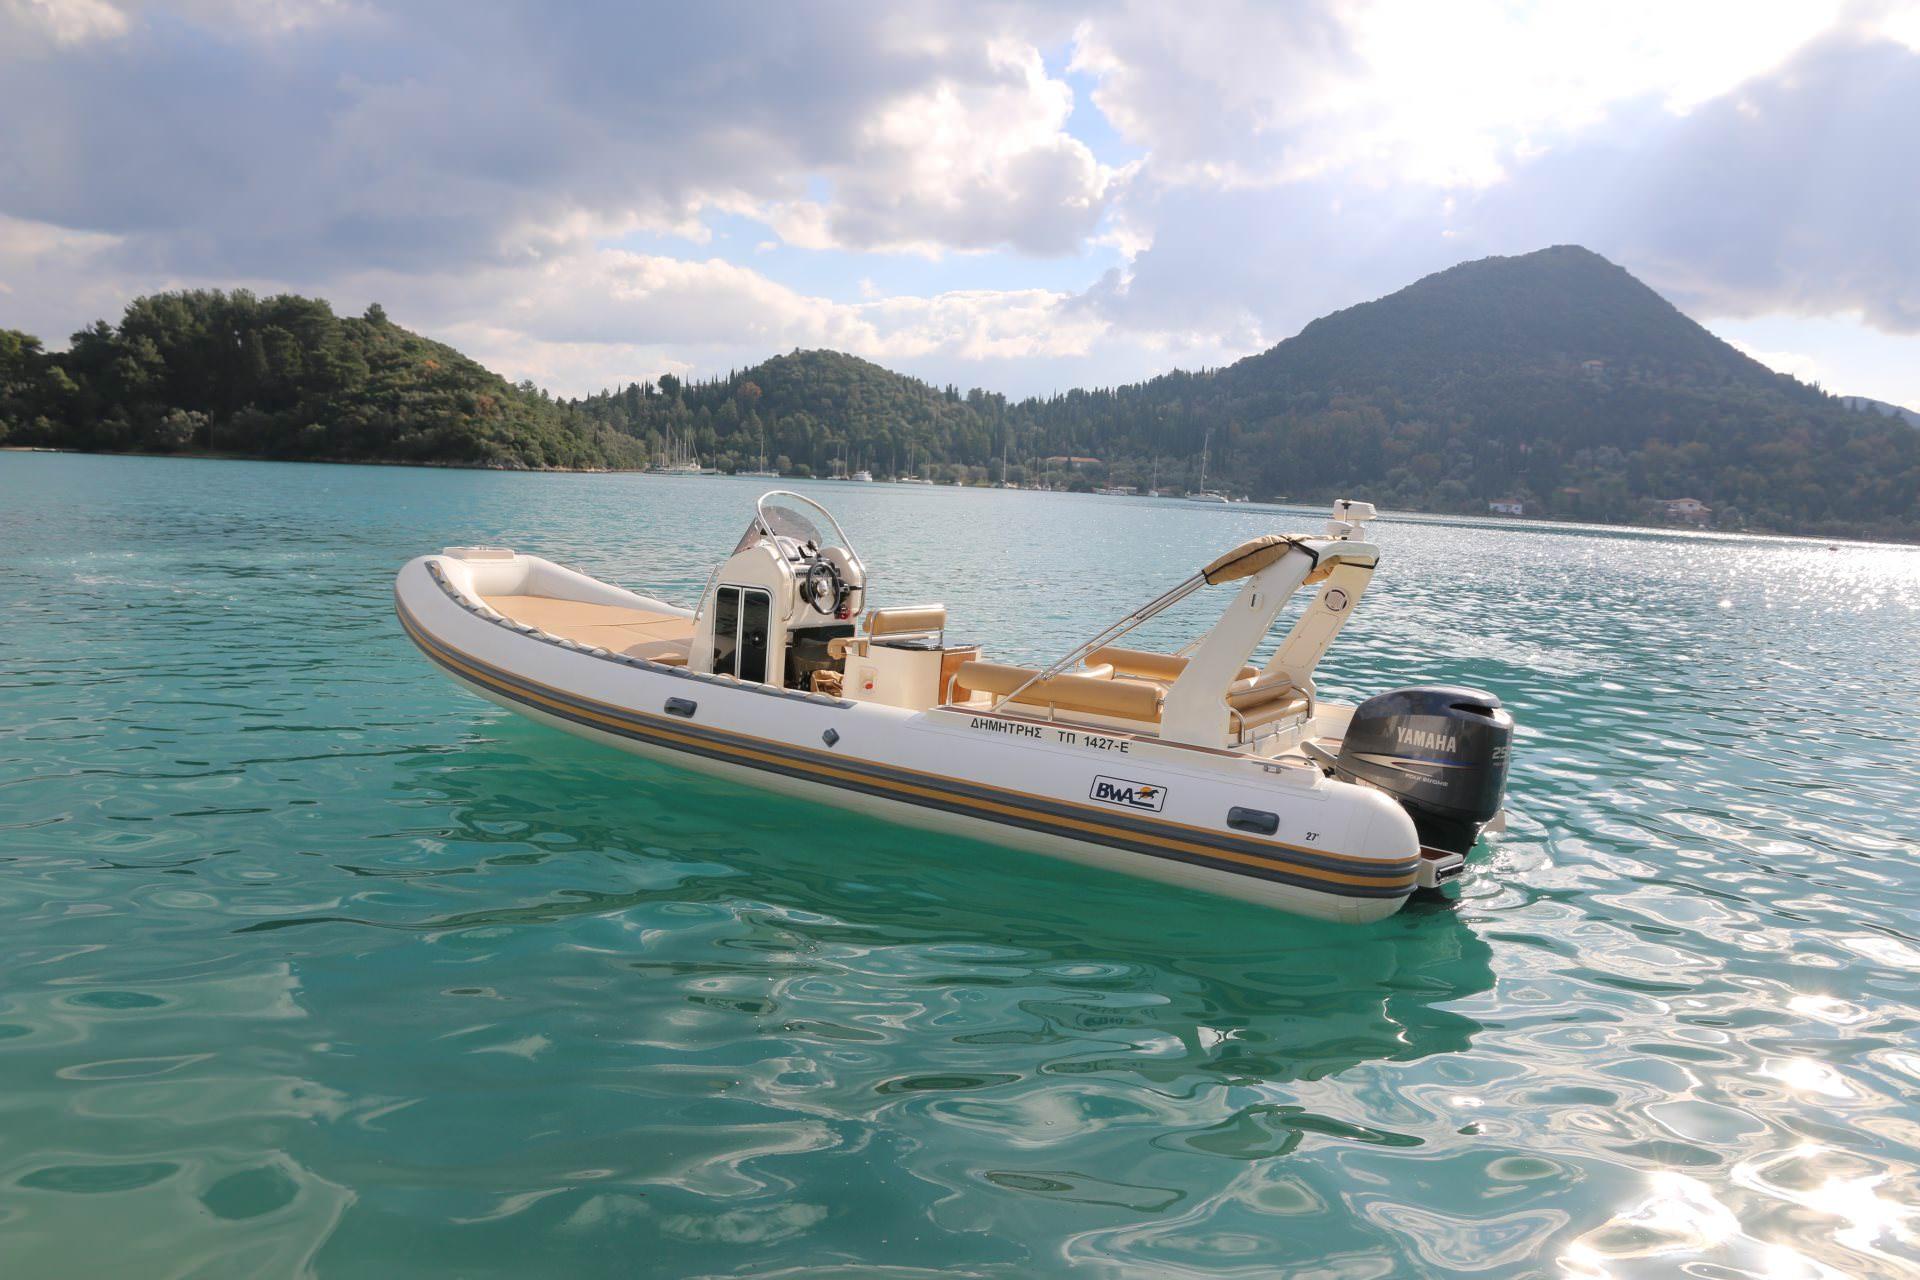 joy5 (5) Trident Boats